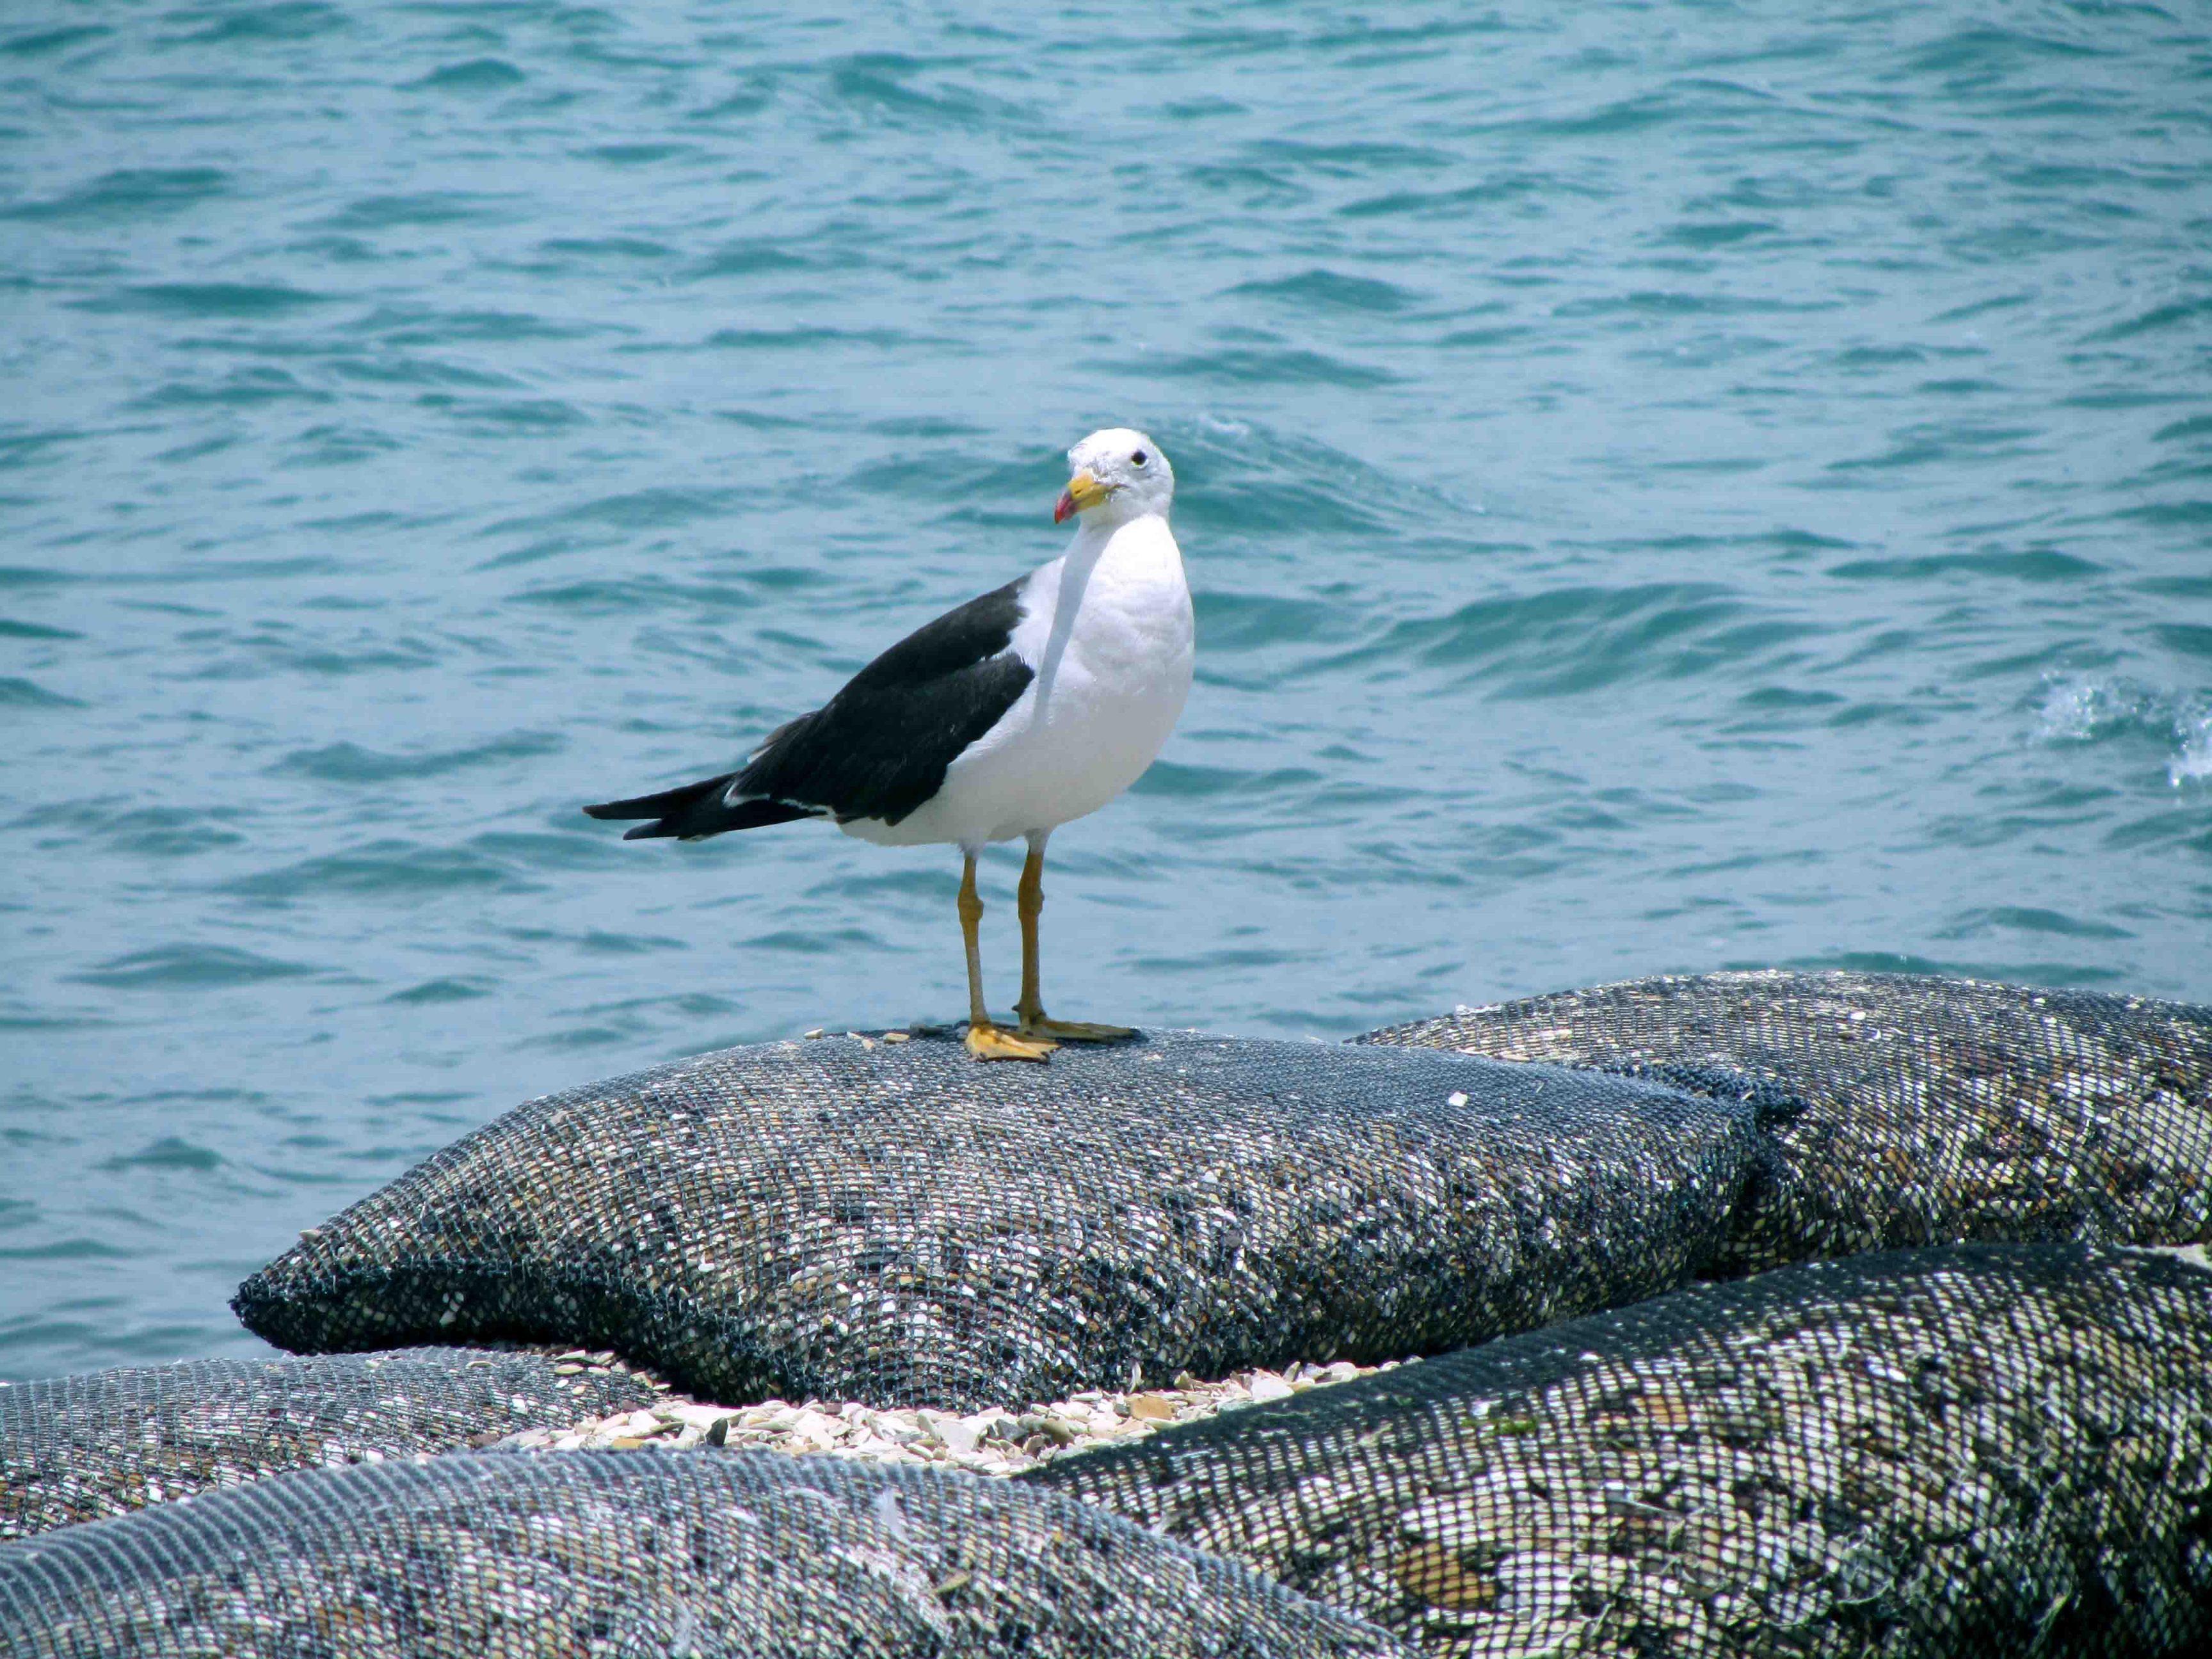 Diversidad de fauna. Wildlife diversity. Paracas, Ica, Peru. Photo credit, placeOK